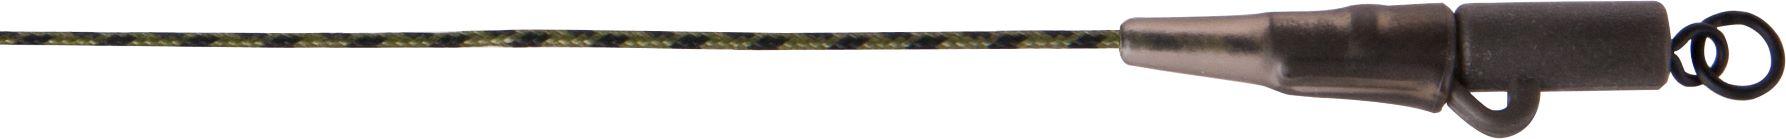 Anaconda závěs na olovo Safety Lead Clip 45 lb, 2ks/bal